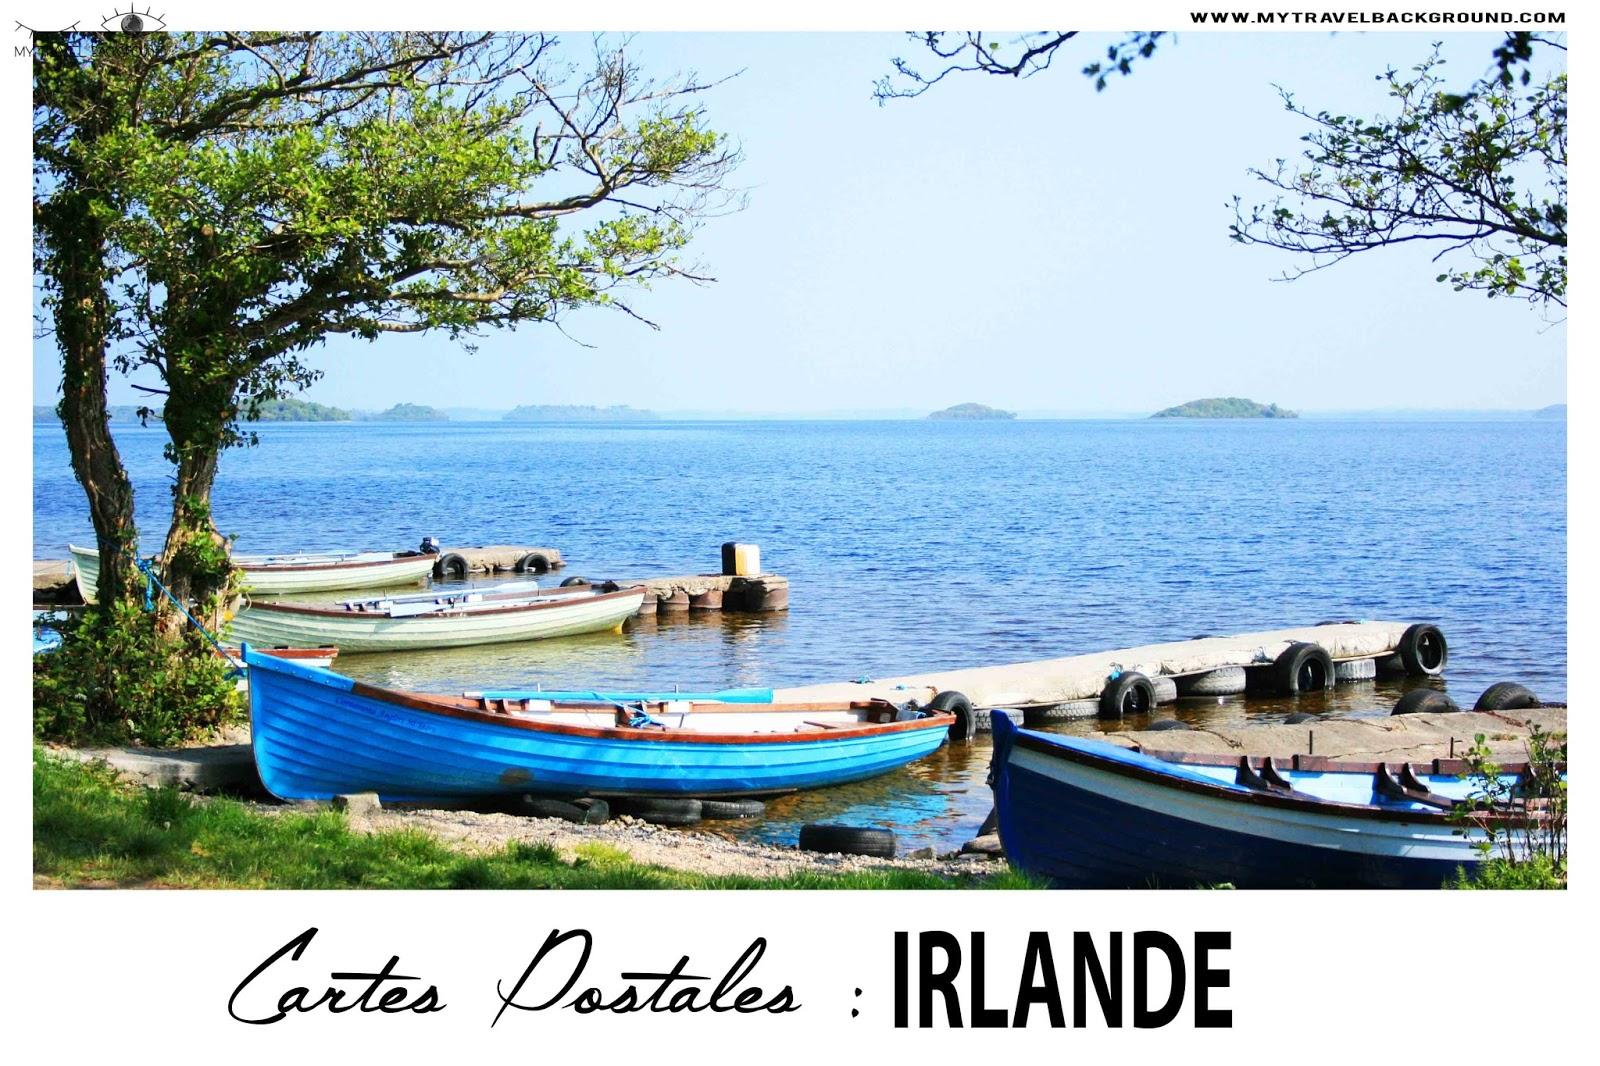 My Travel Background : Cartes Postale Irlande